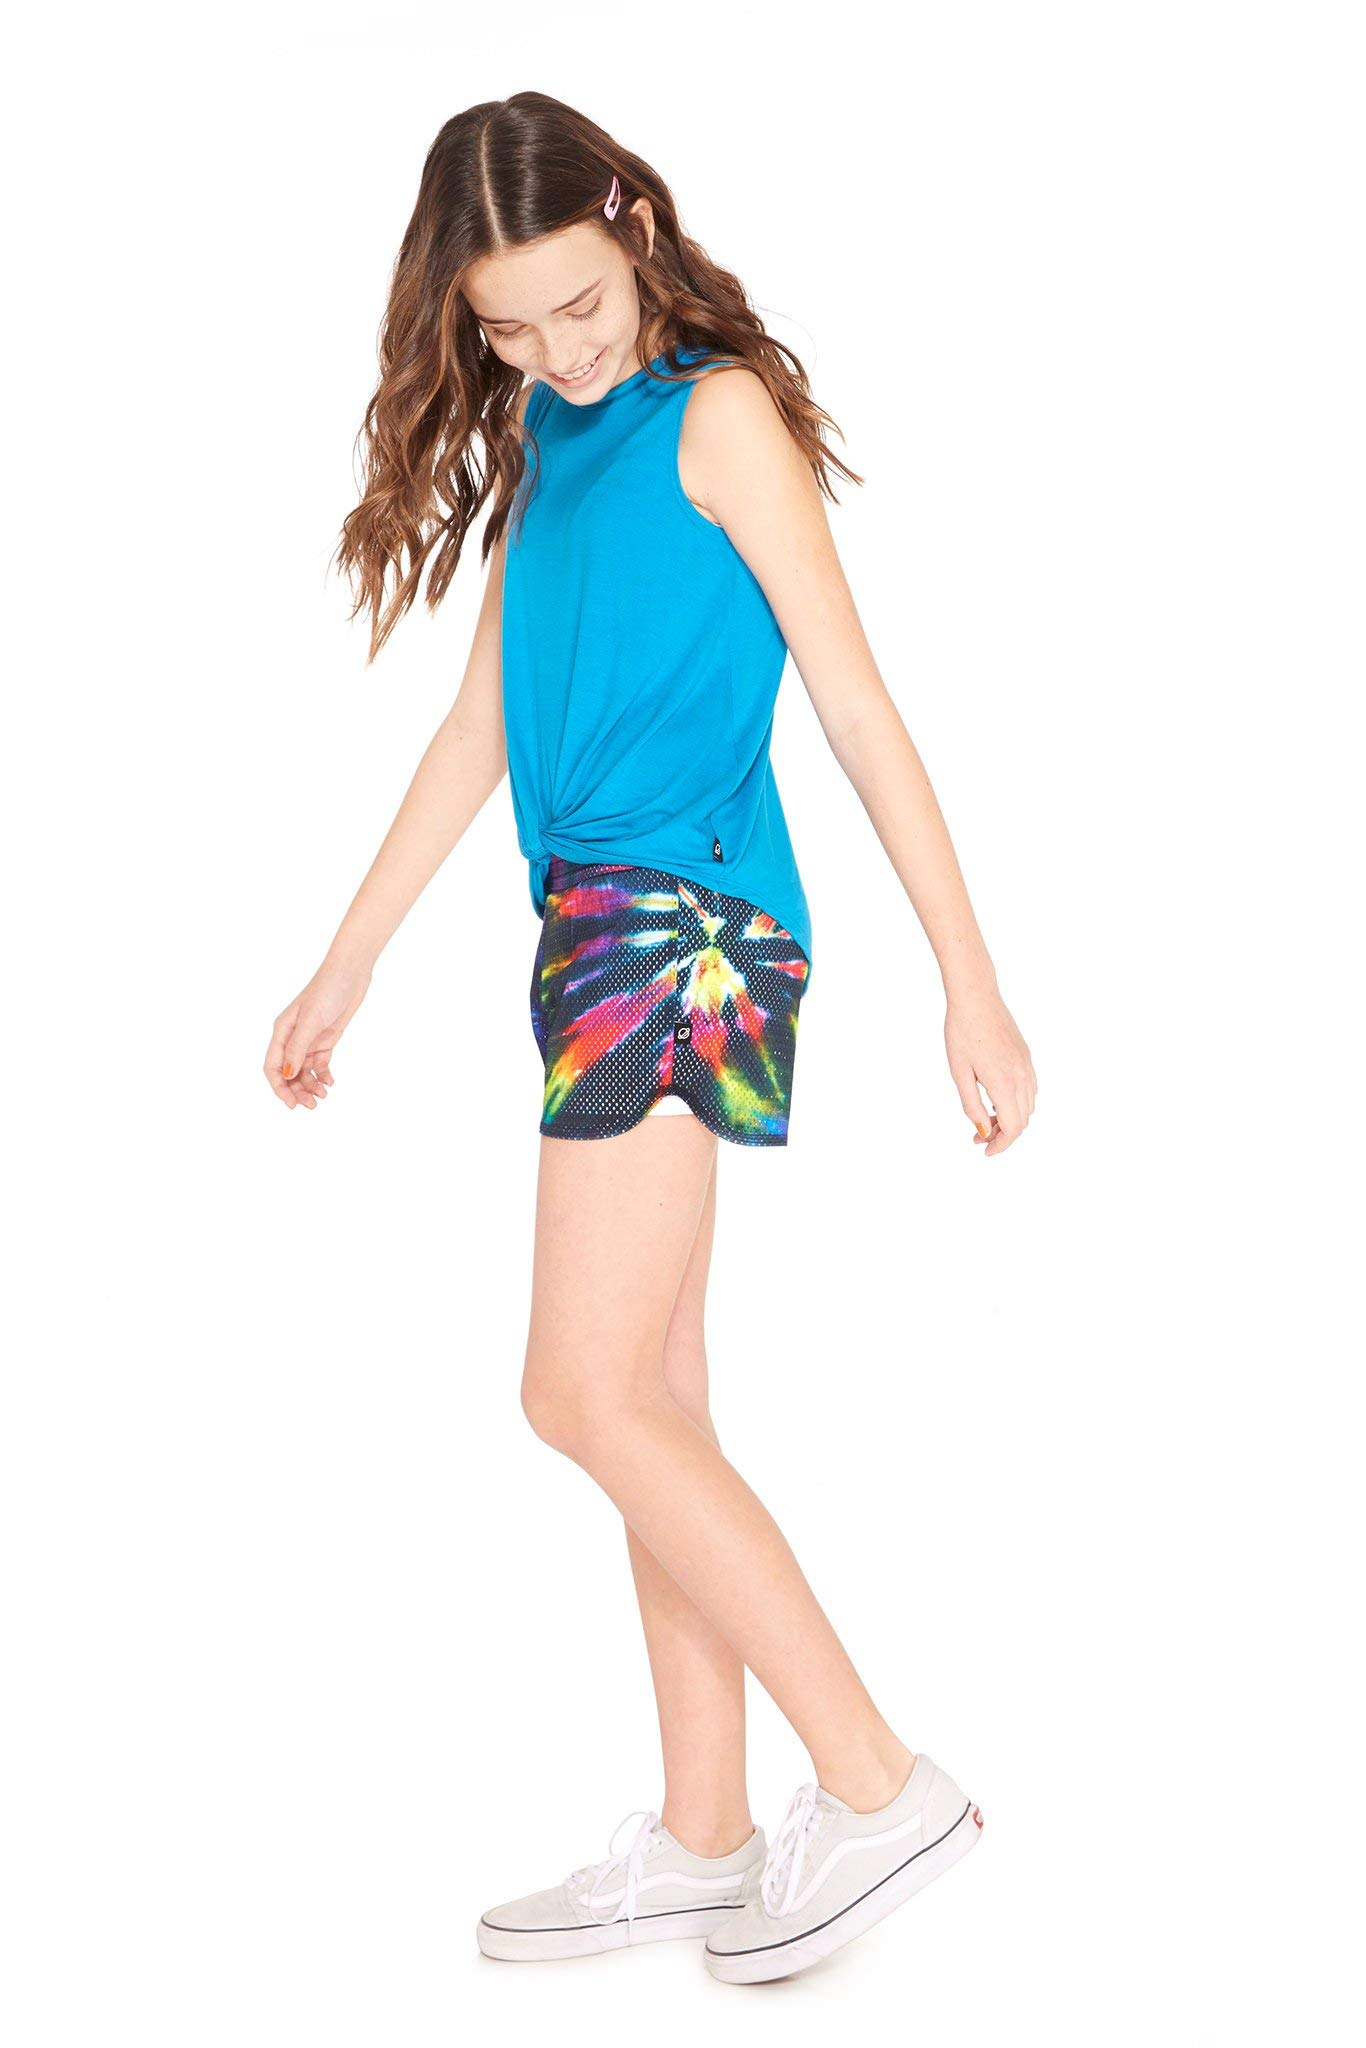 Terez Girls Classic Mesh Shorts (Tie Dye, 4 - Small) by Terez (Image #2)